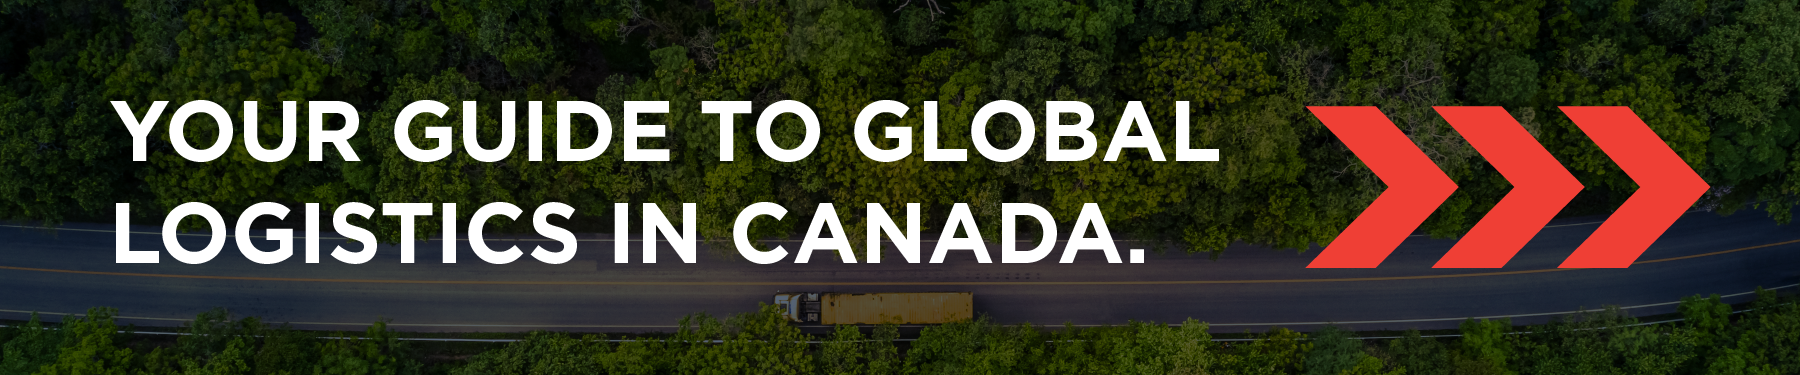 Global Logistics Canada